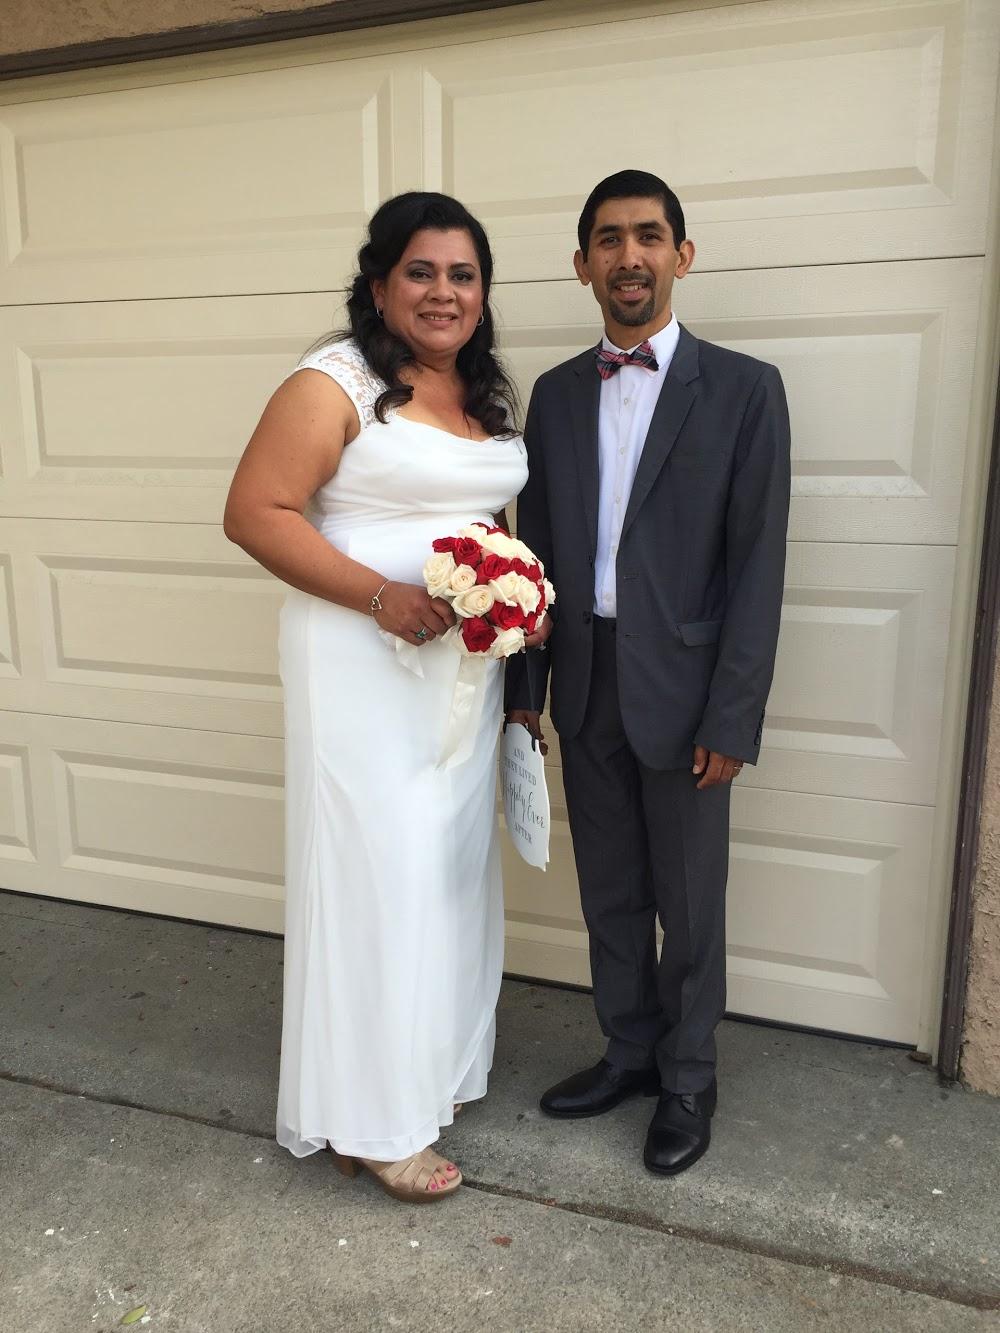 Wedding Officiant – Reverend Michael Ramirez